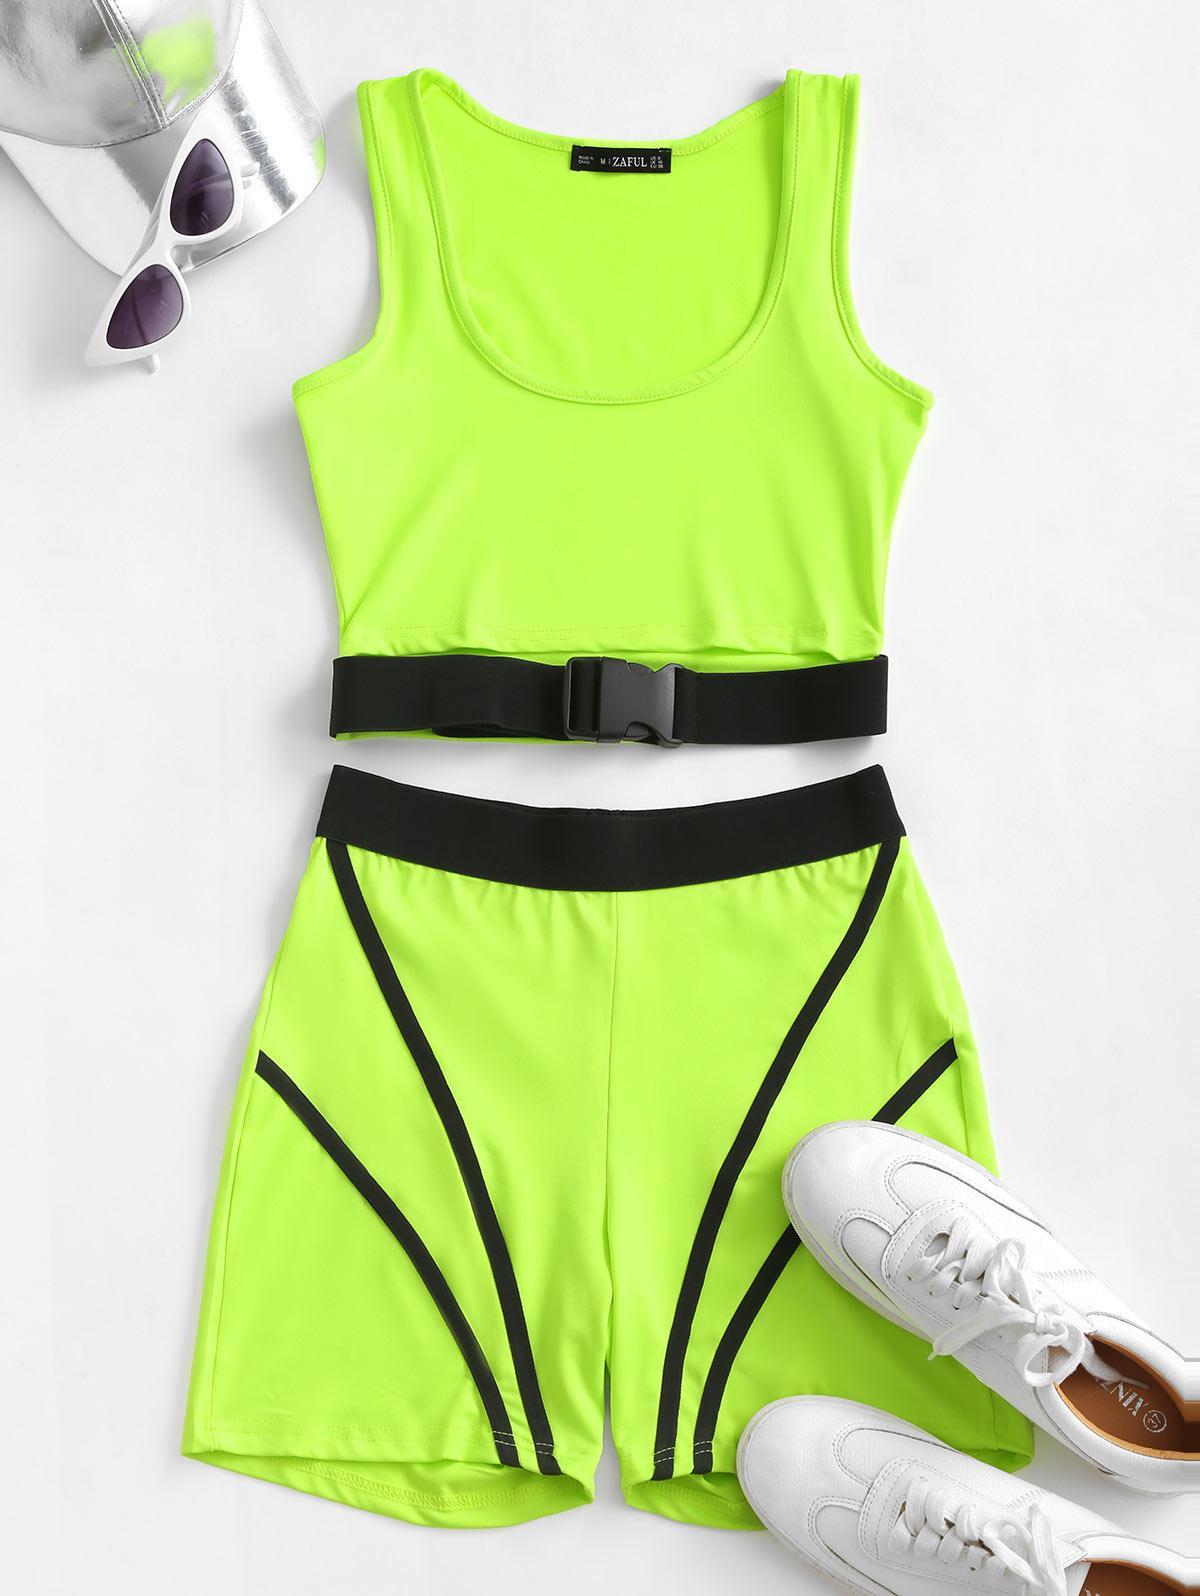 ZAFUL Neon Push Buckle Colorblock Skinny Shorts Set